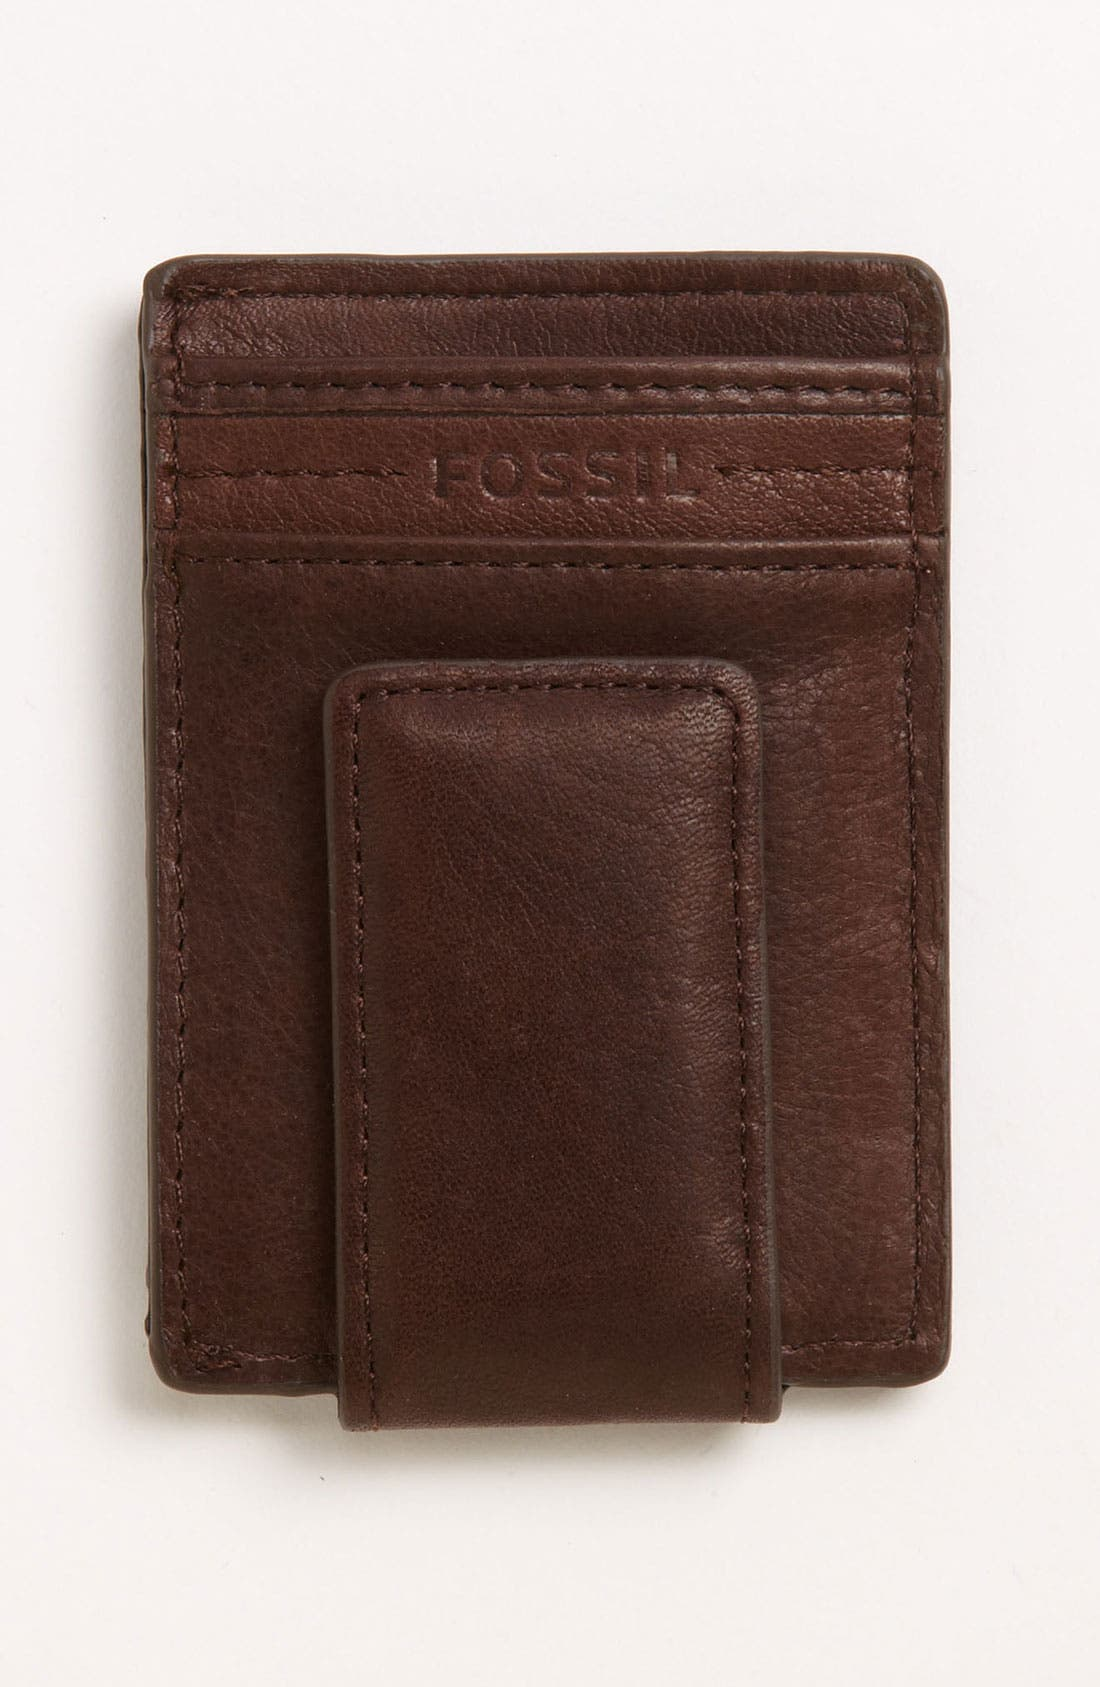 Alternate Image 1 Selected - Fossil 'Mag' Card Holder